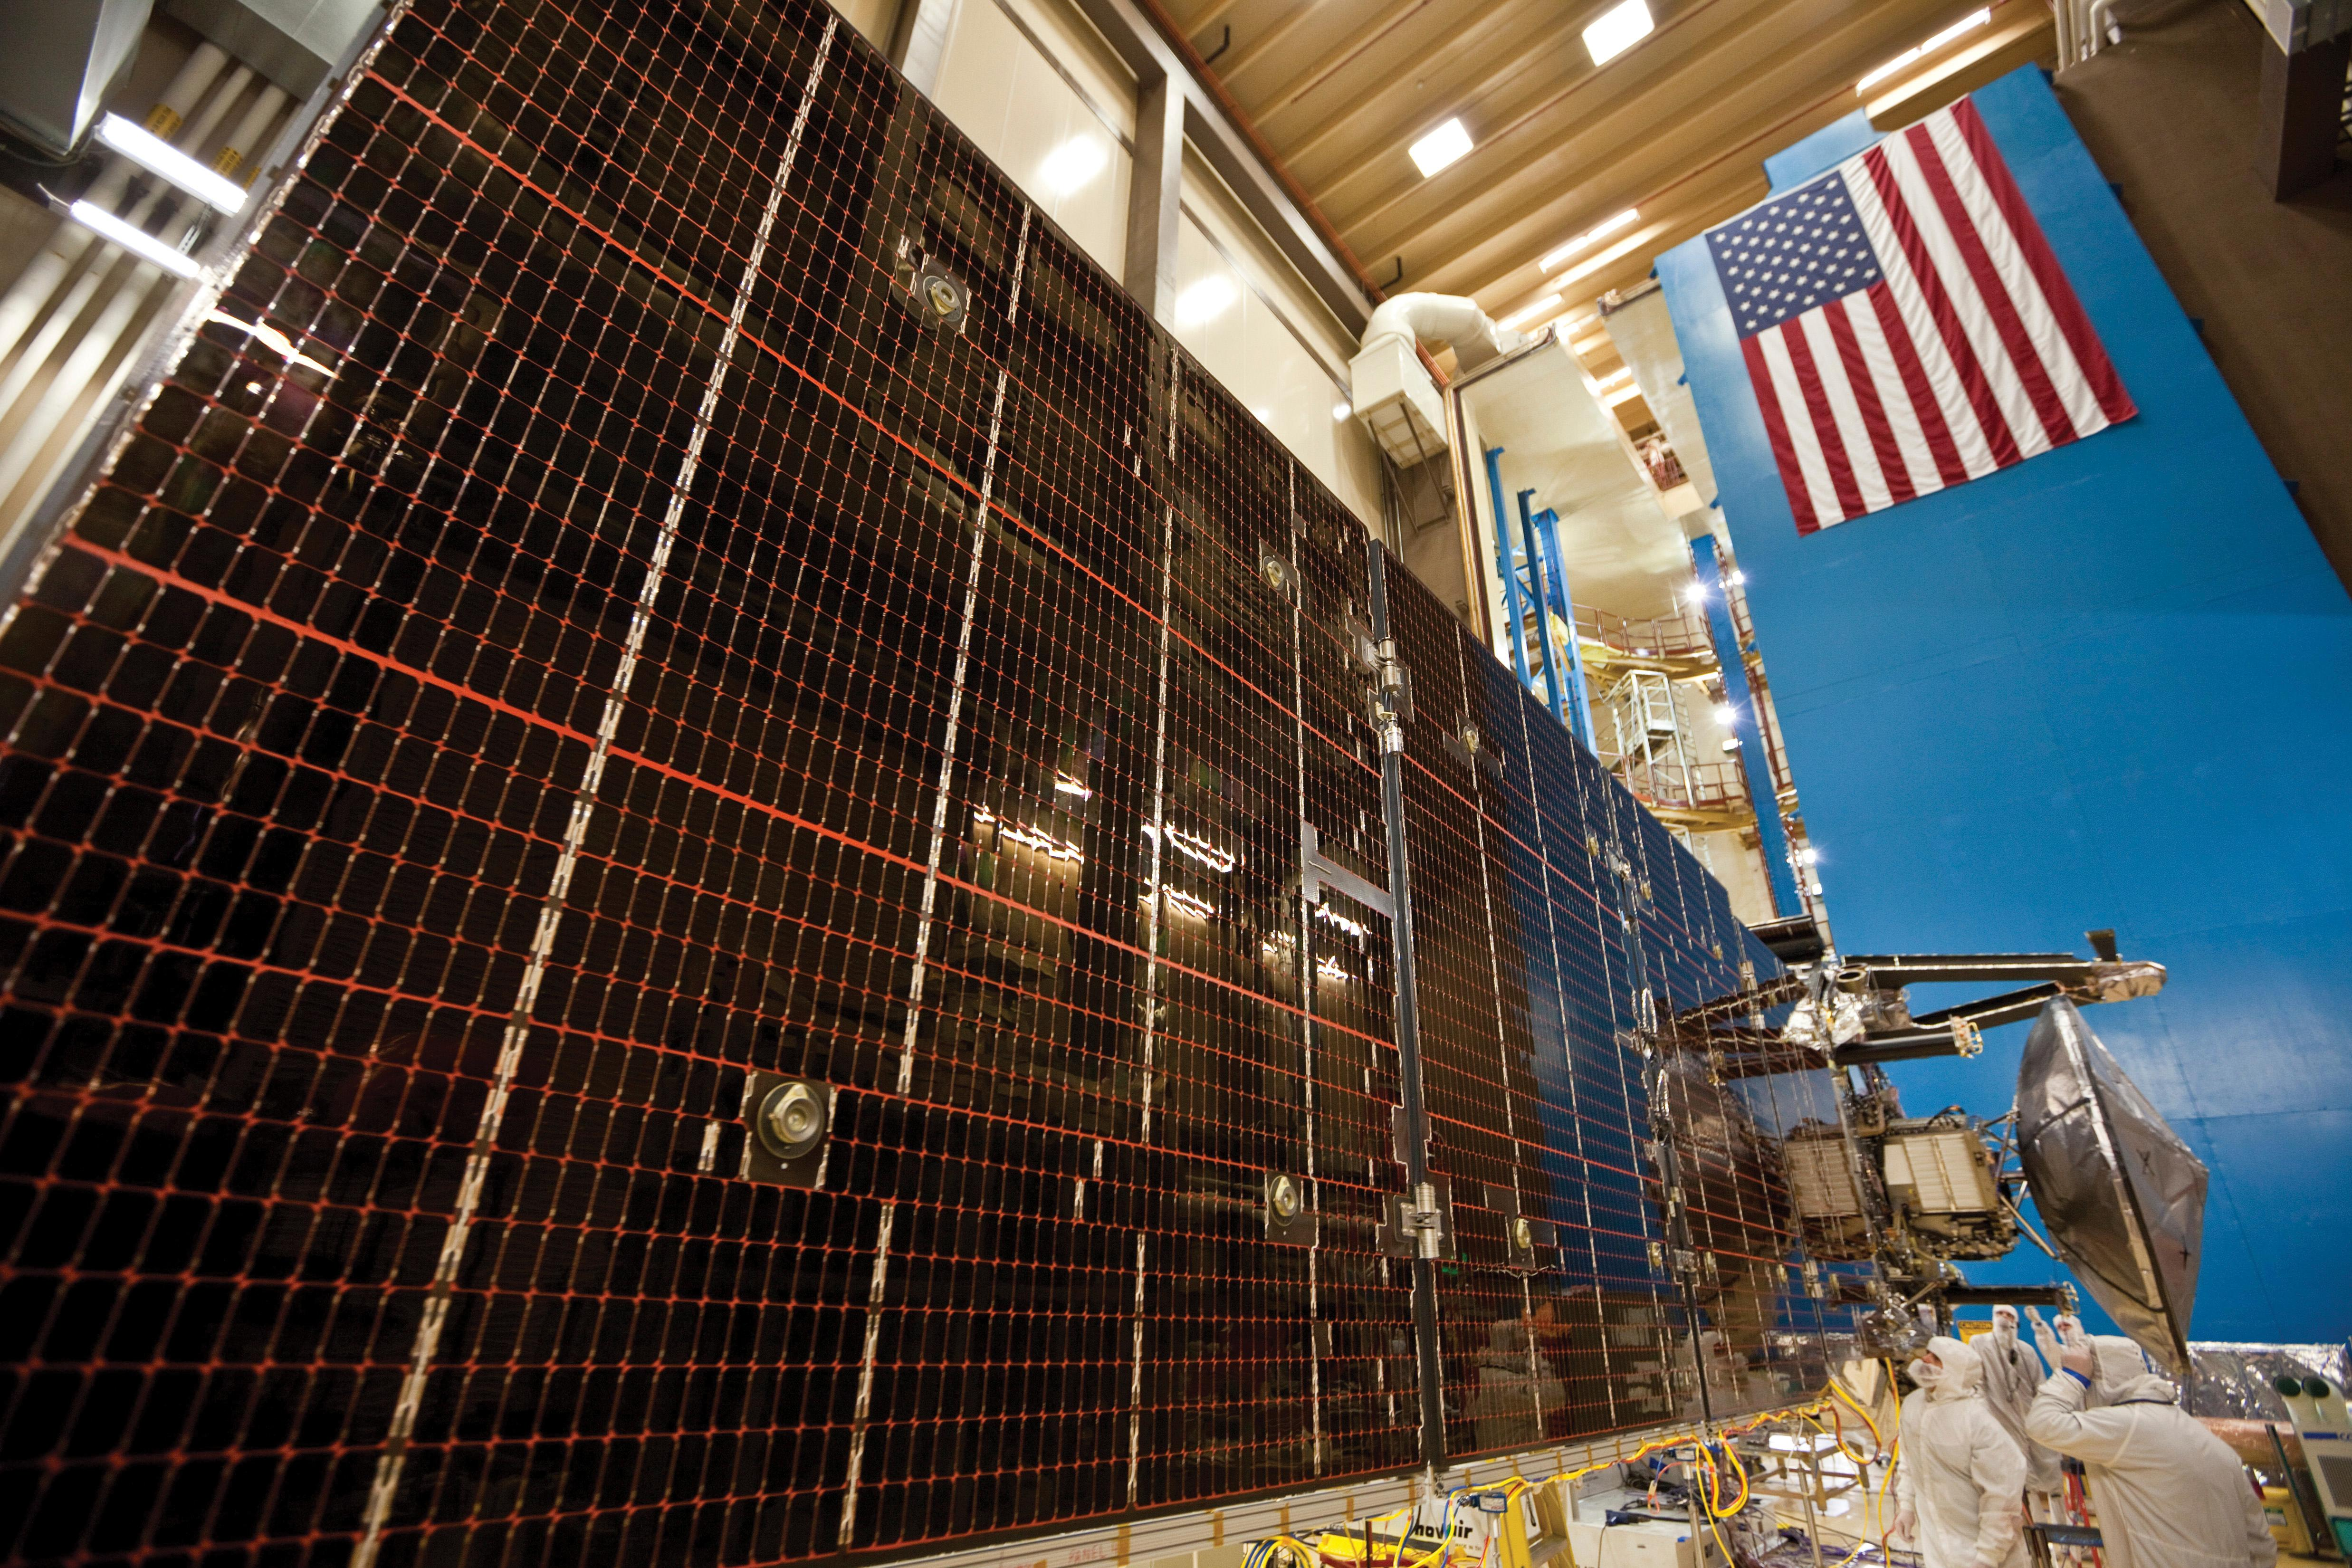 Juno's three solar arrays